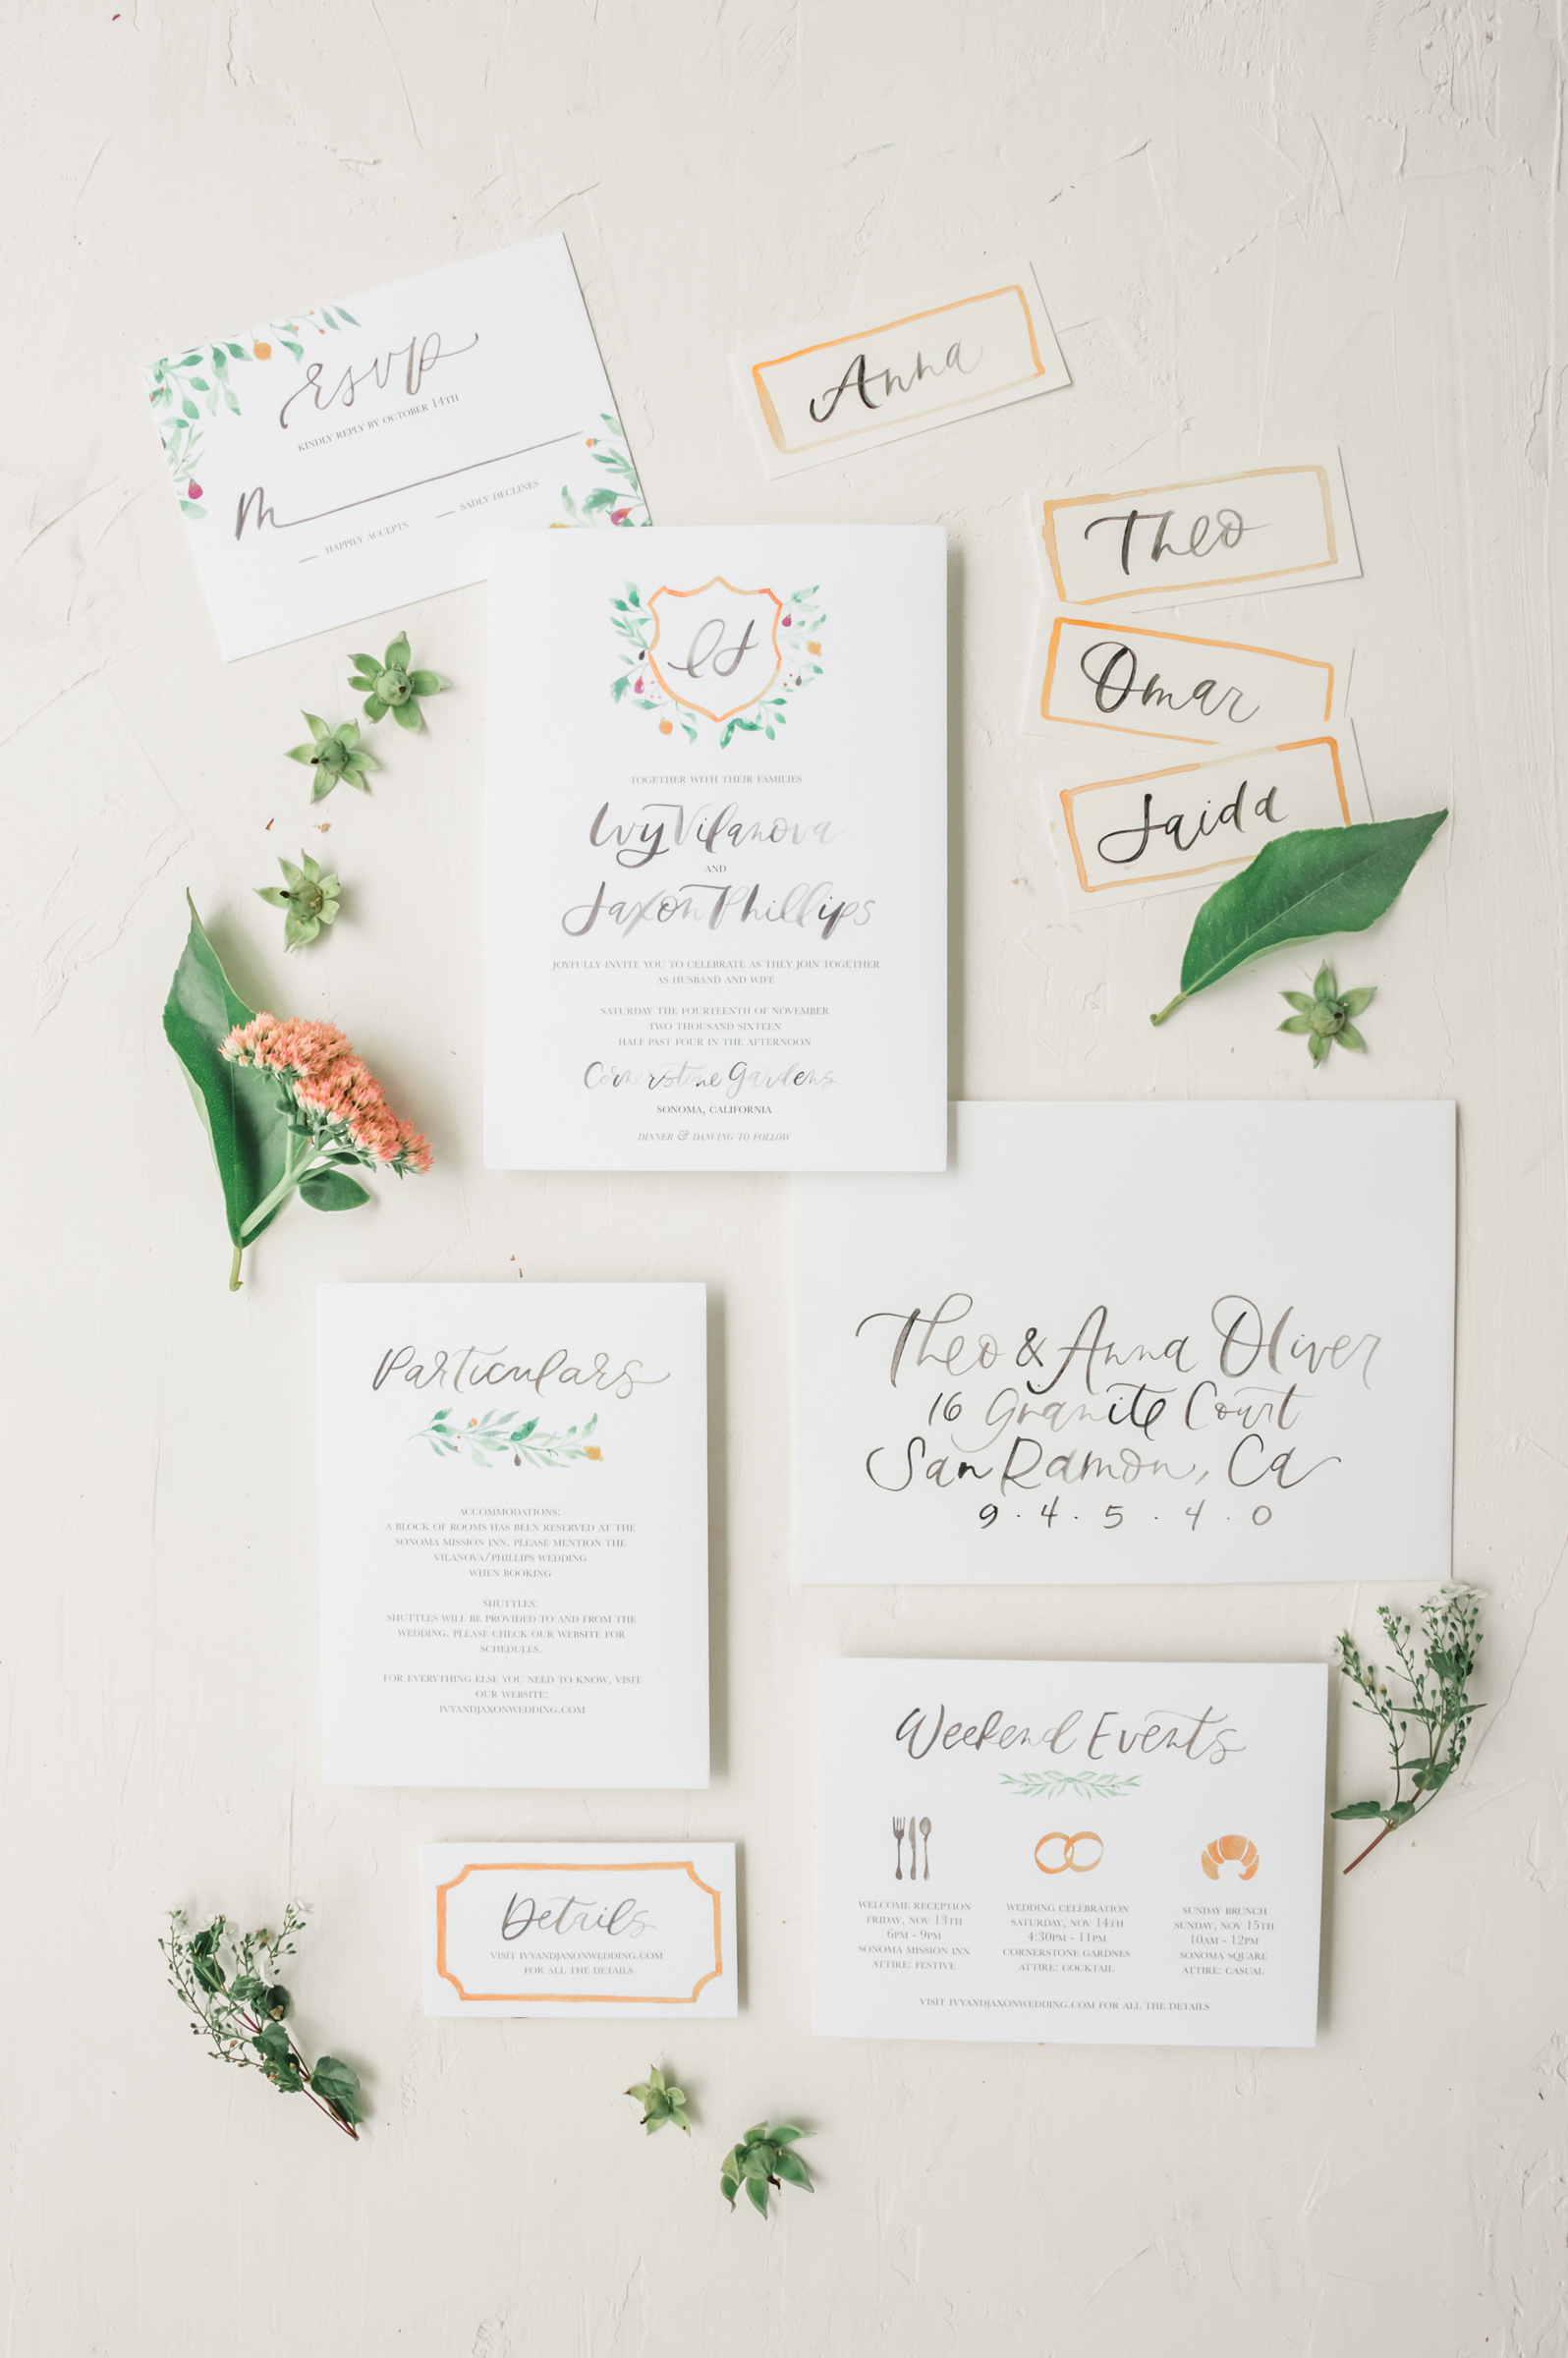 Watercolor wedding crest invitation